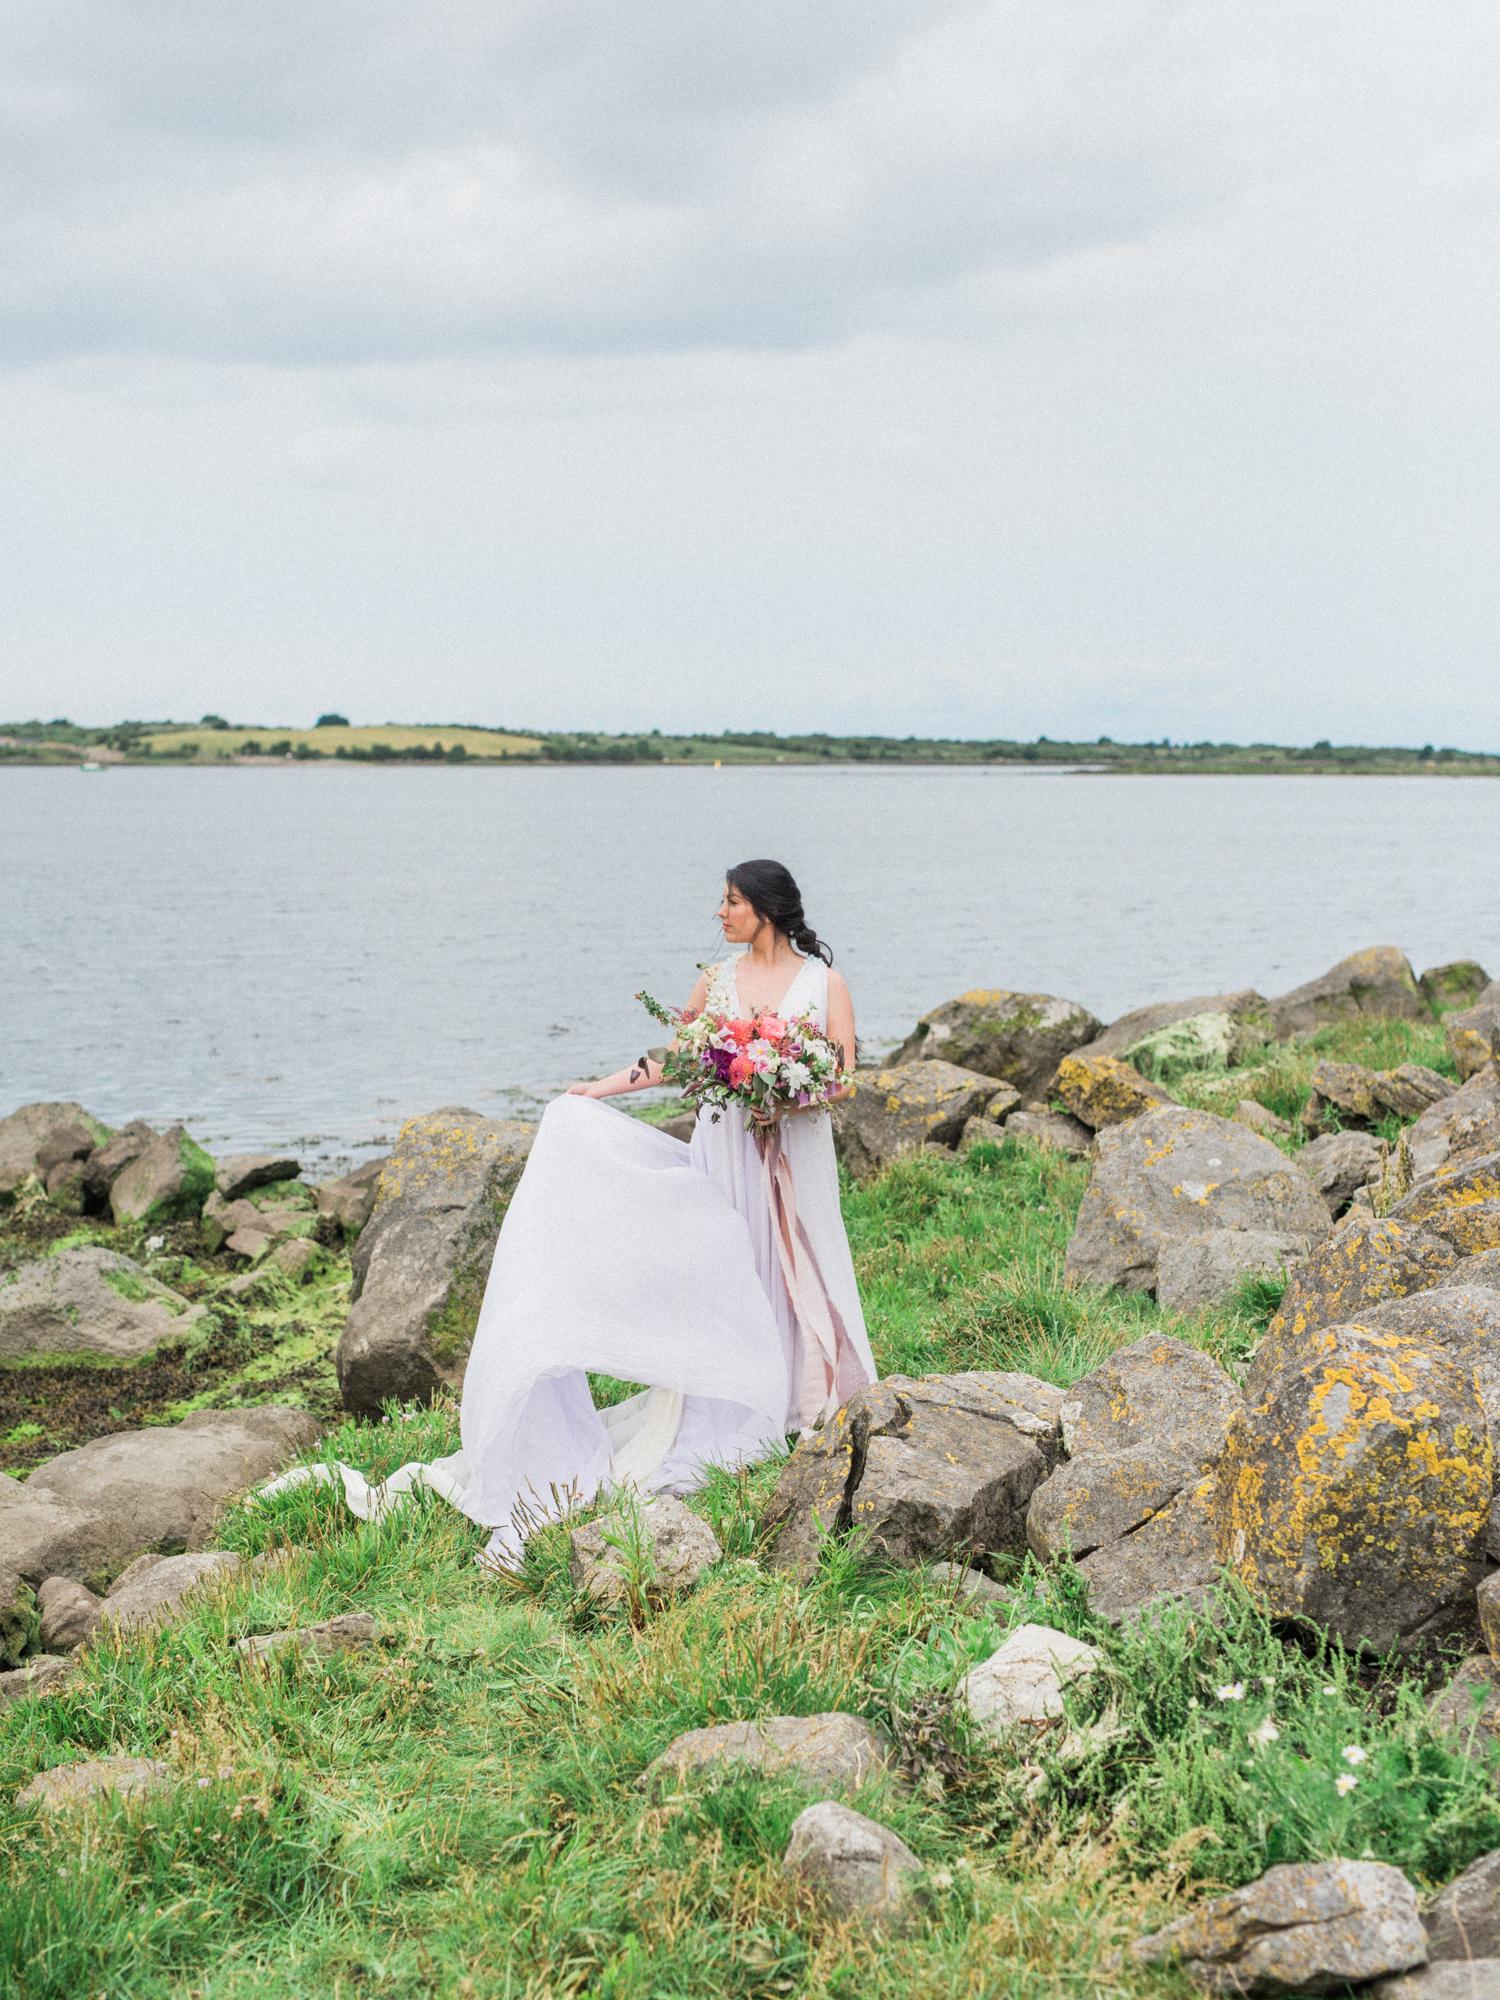 DanielleGirouxPhotography_EuropeTrip0C6A1582.jpg